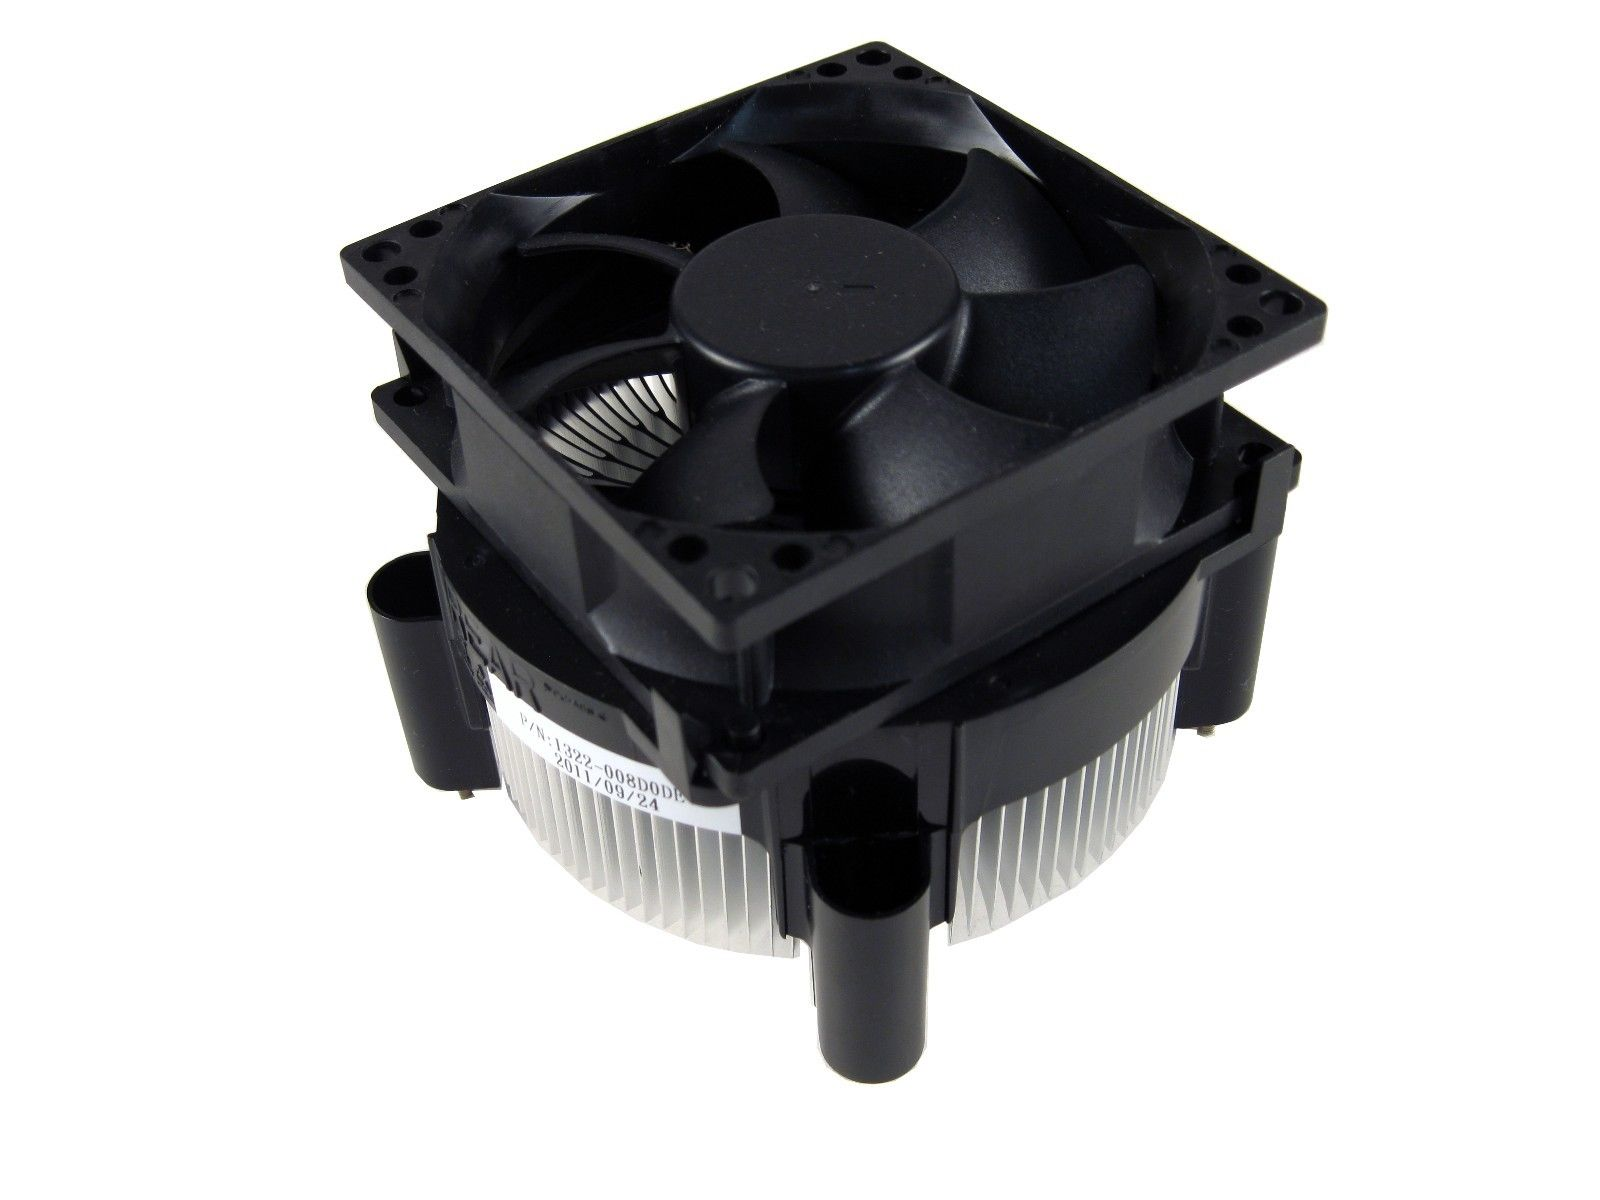 K078D Original Dell CPU Heatsink Cooling Fan Assembly